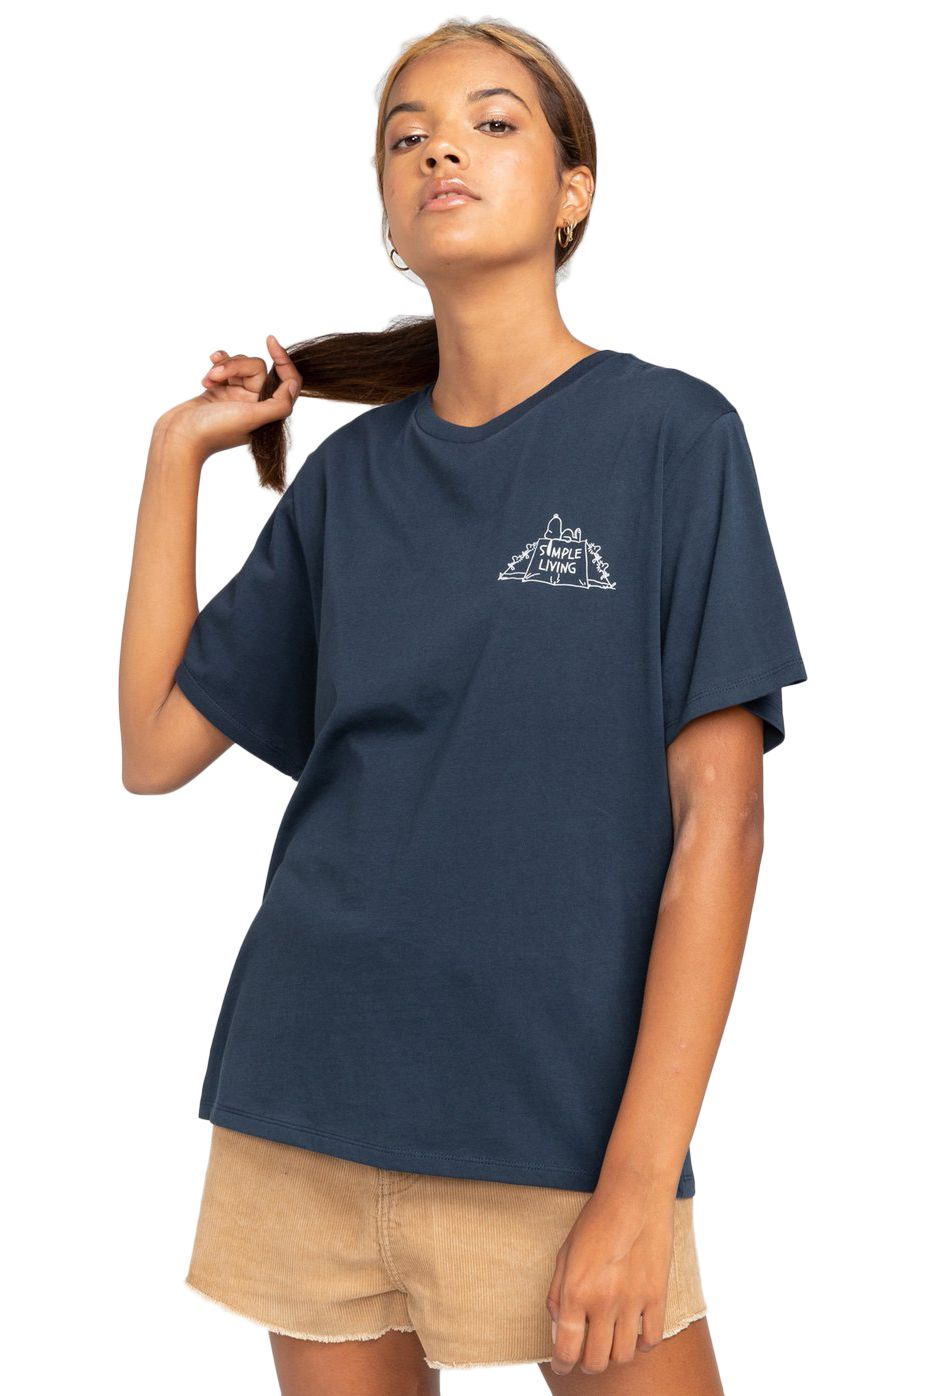 Element T-Shirt PEANUTS SIMPLE LIVIN PEANUTS Eclipse Navy